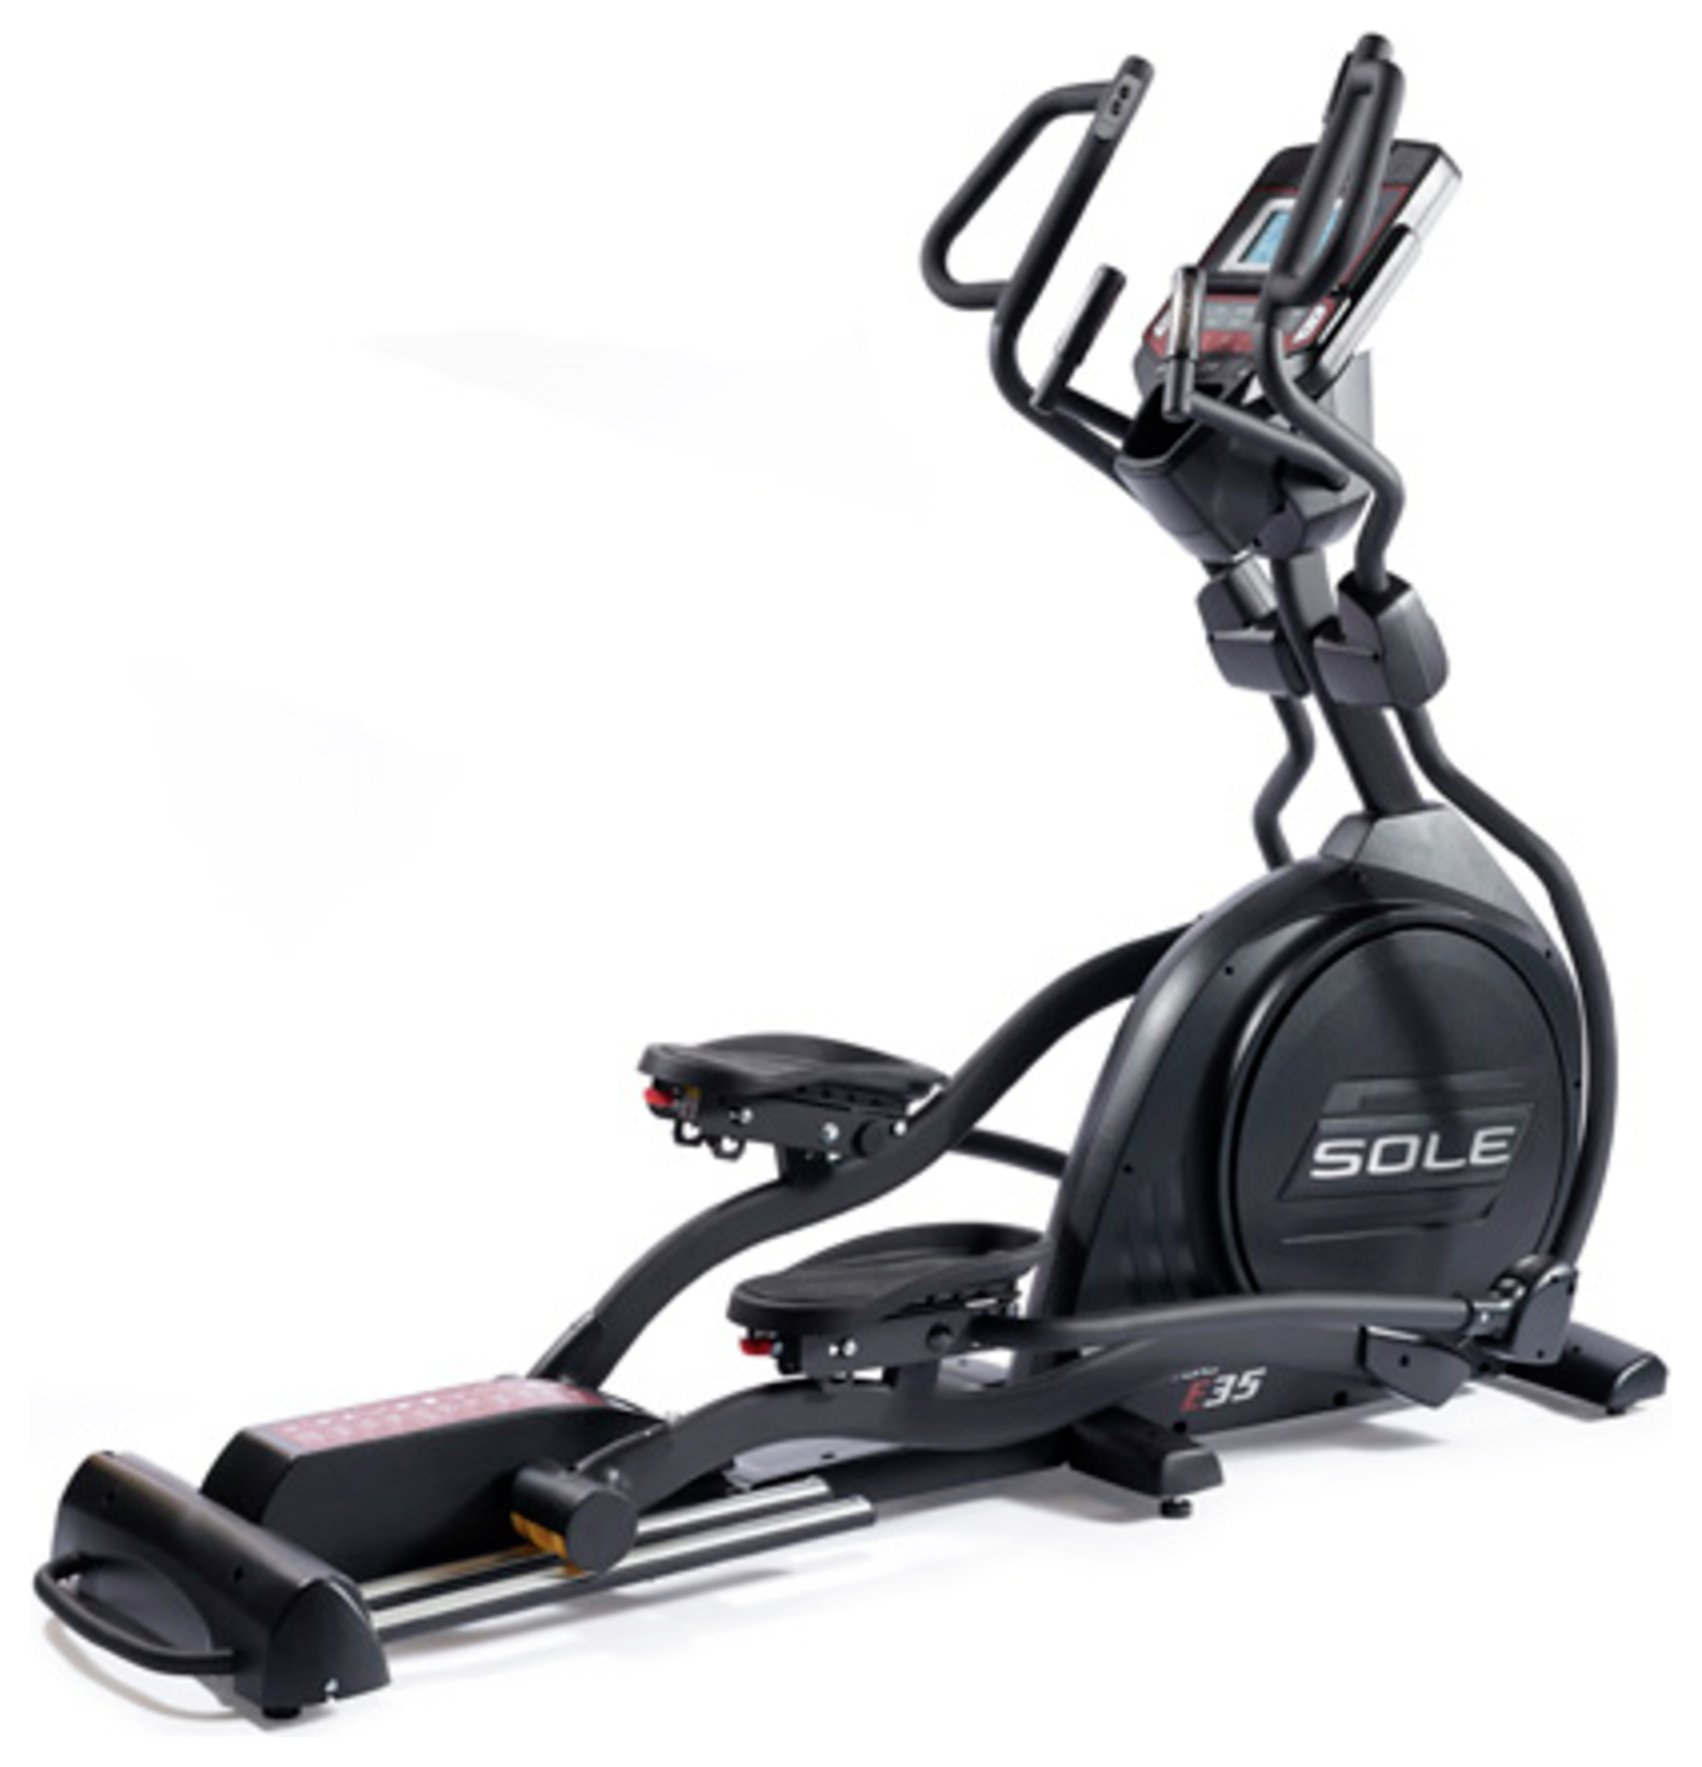 Sole Fitness - E35 2016 Elliptical Trainer